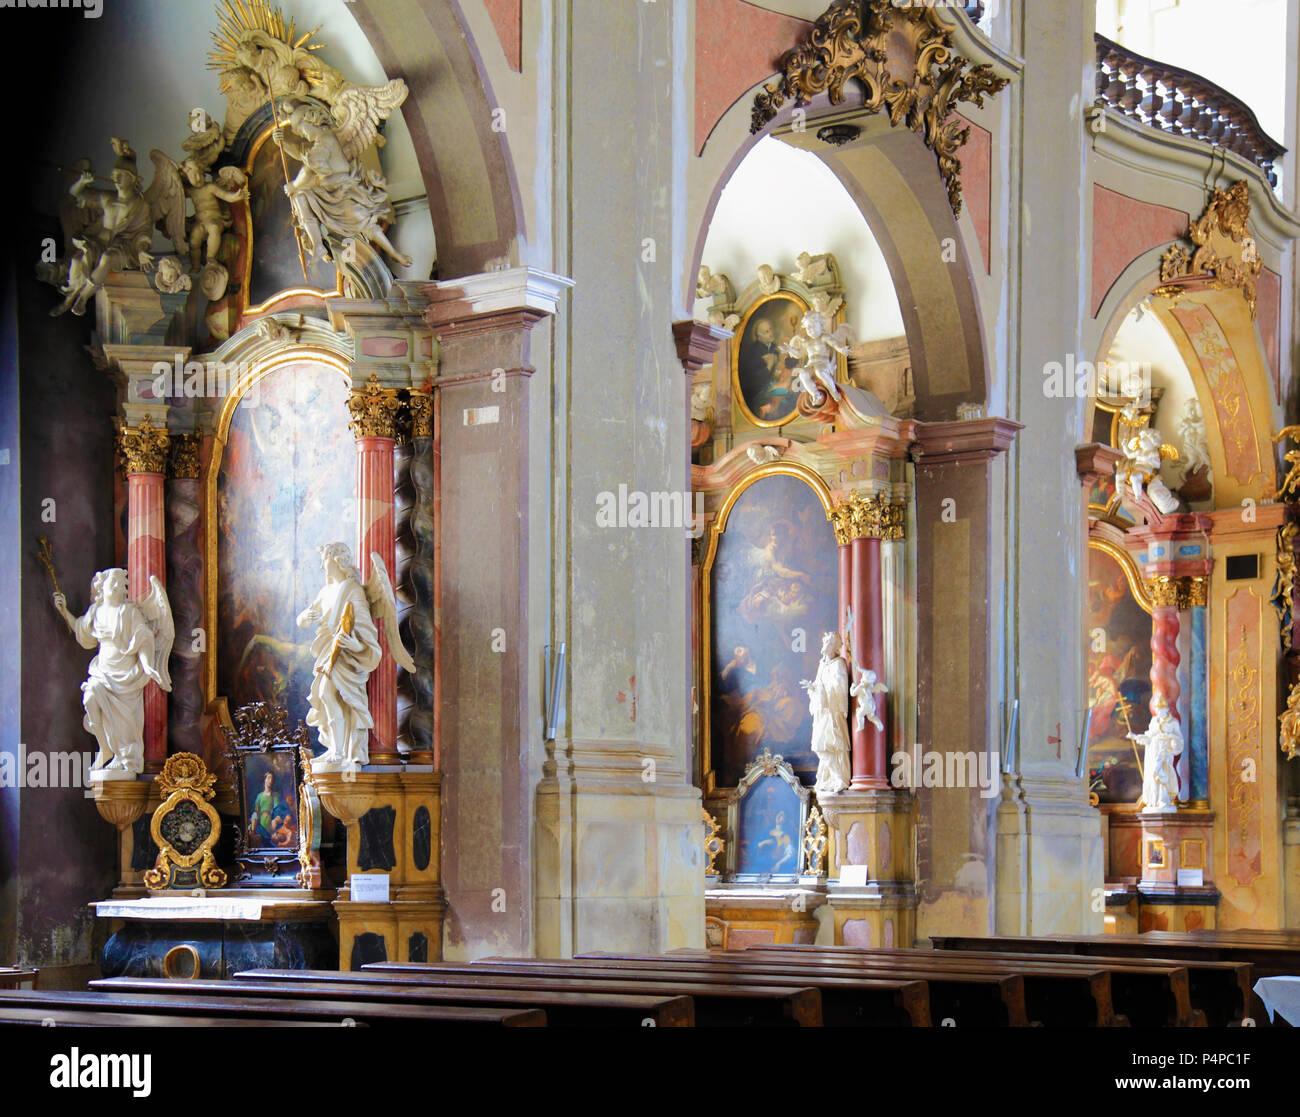 Czech Republic, Moravia, Olomouc, Our Lady of the Snows, church, interior, - Stock Image